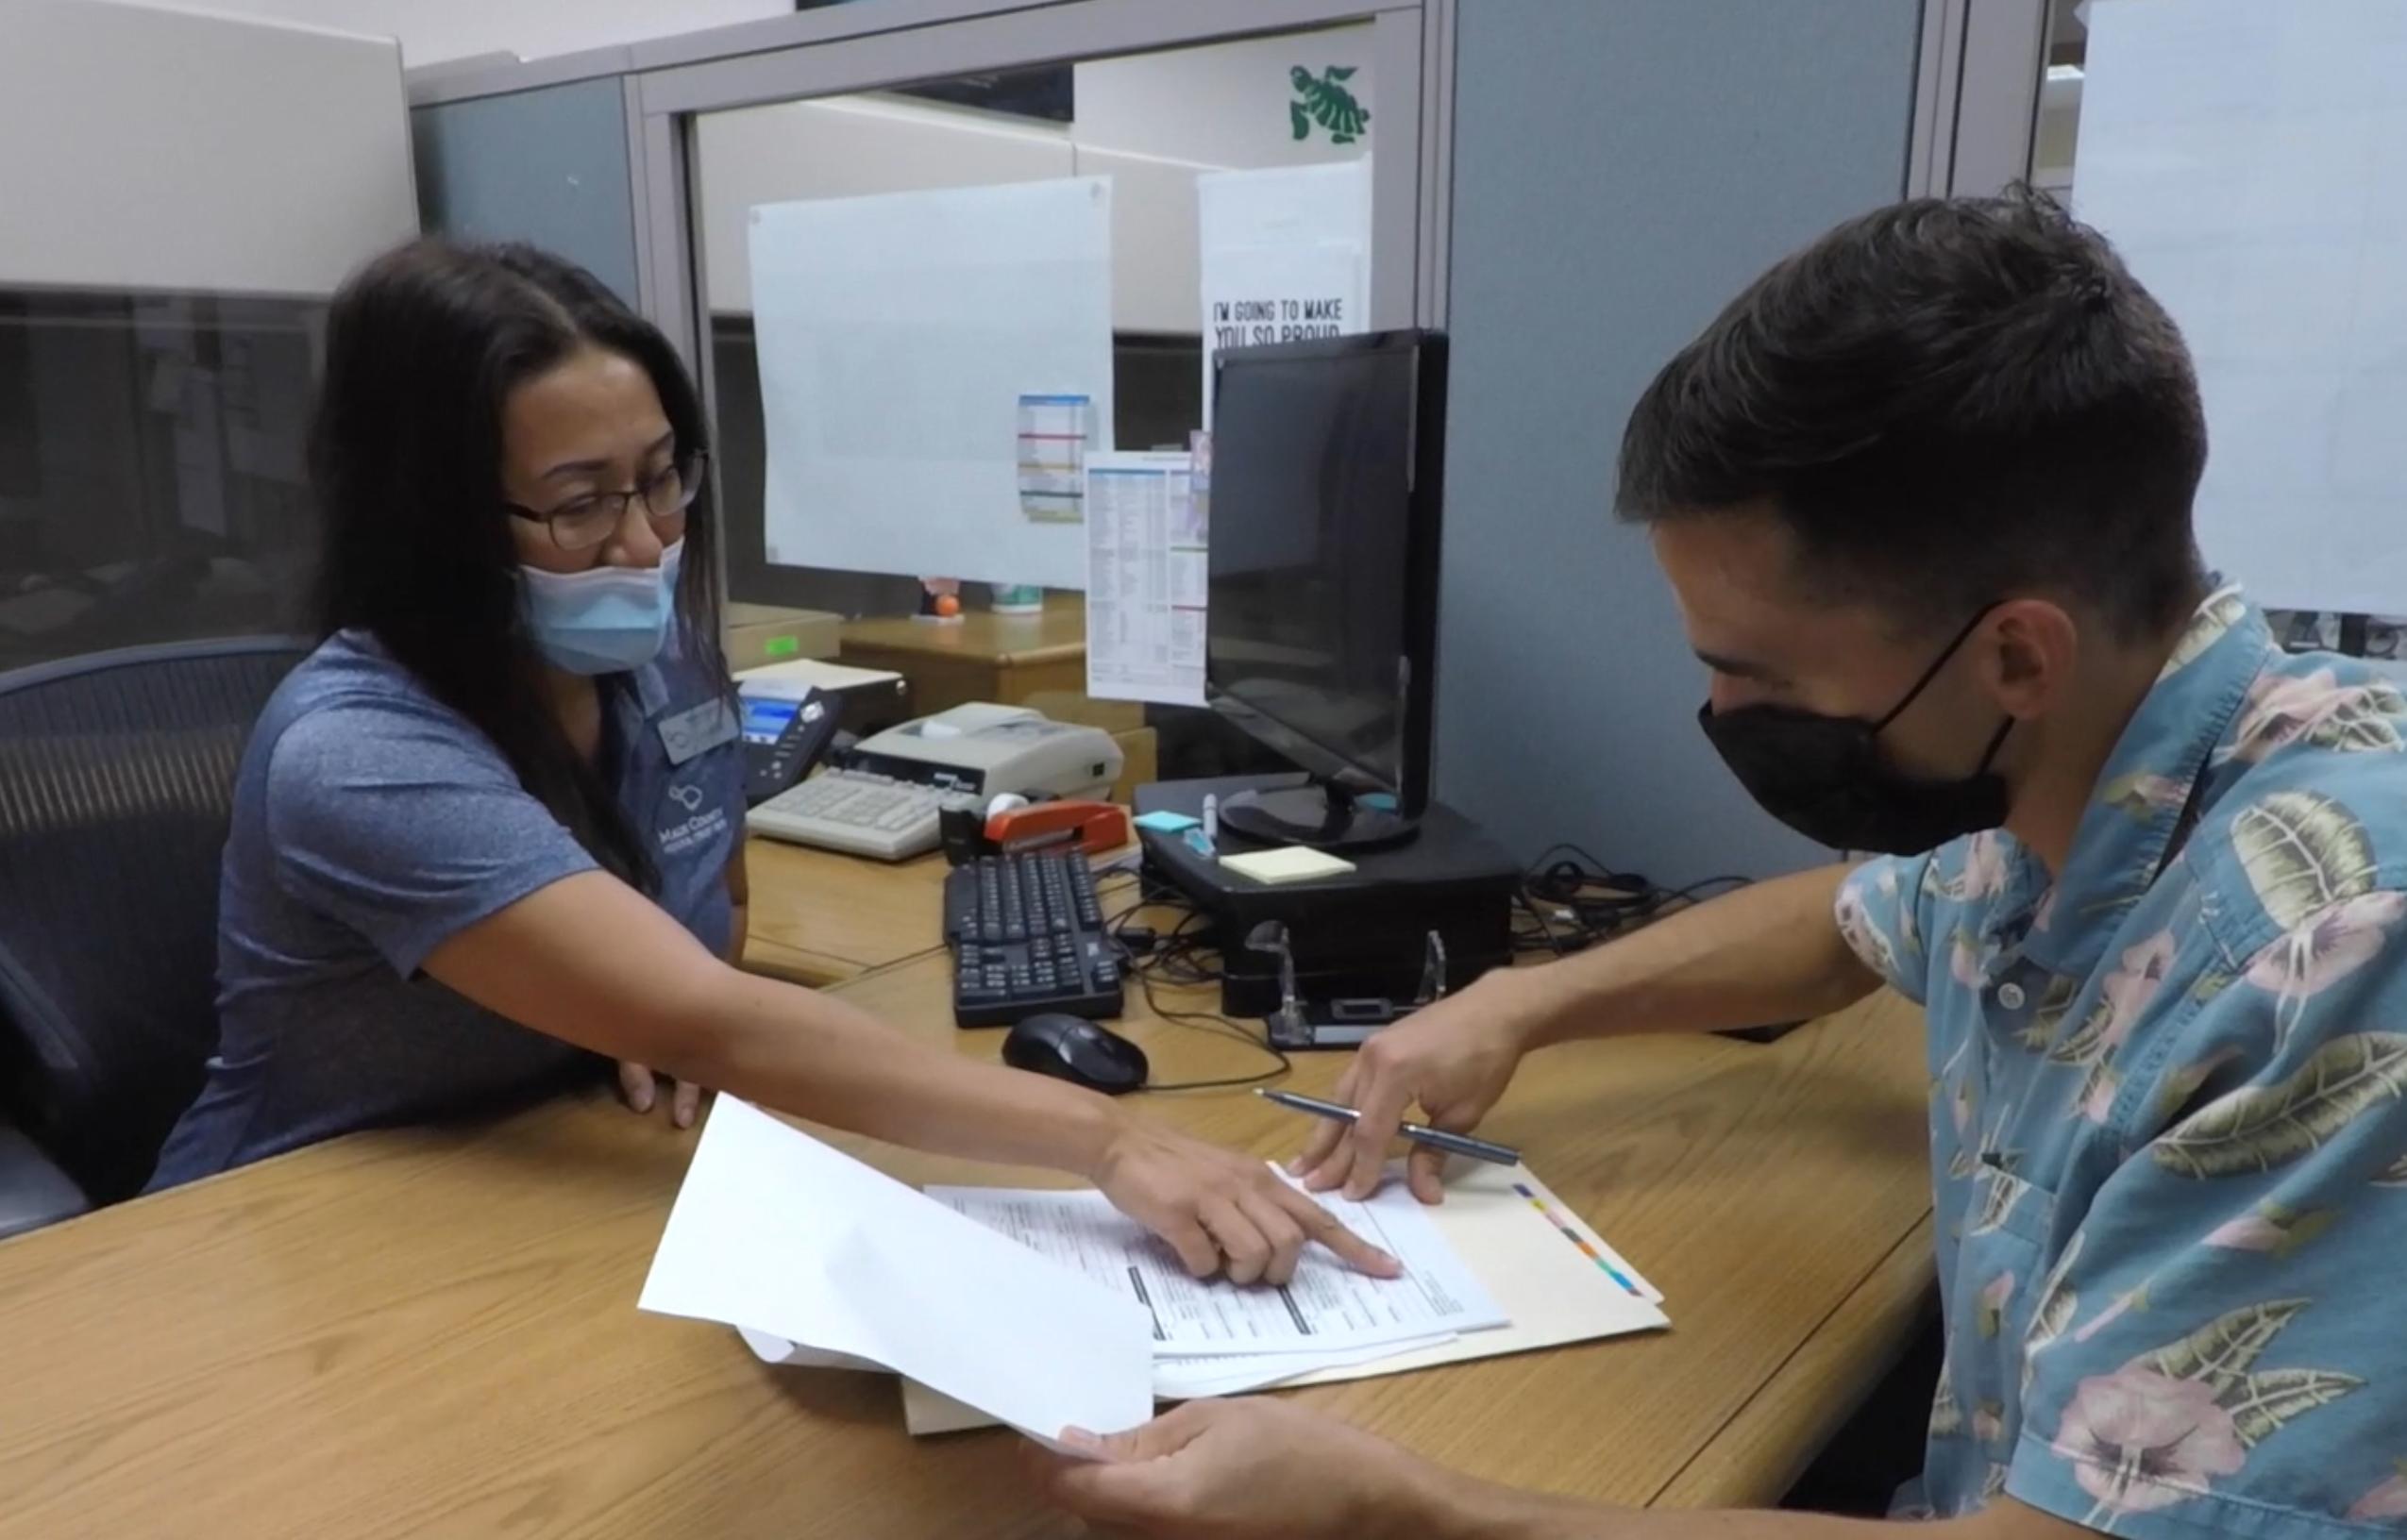 Business Spotlight: Maui County Federal Credit Union